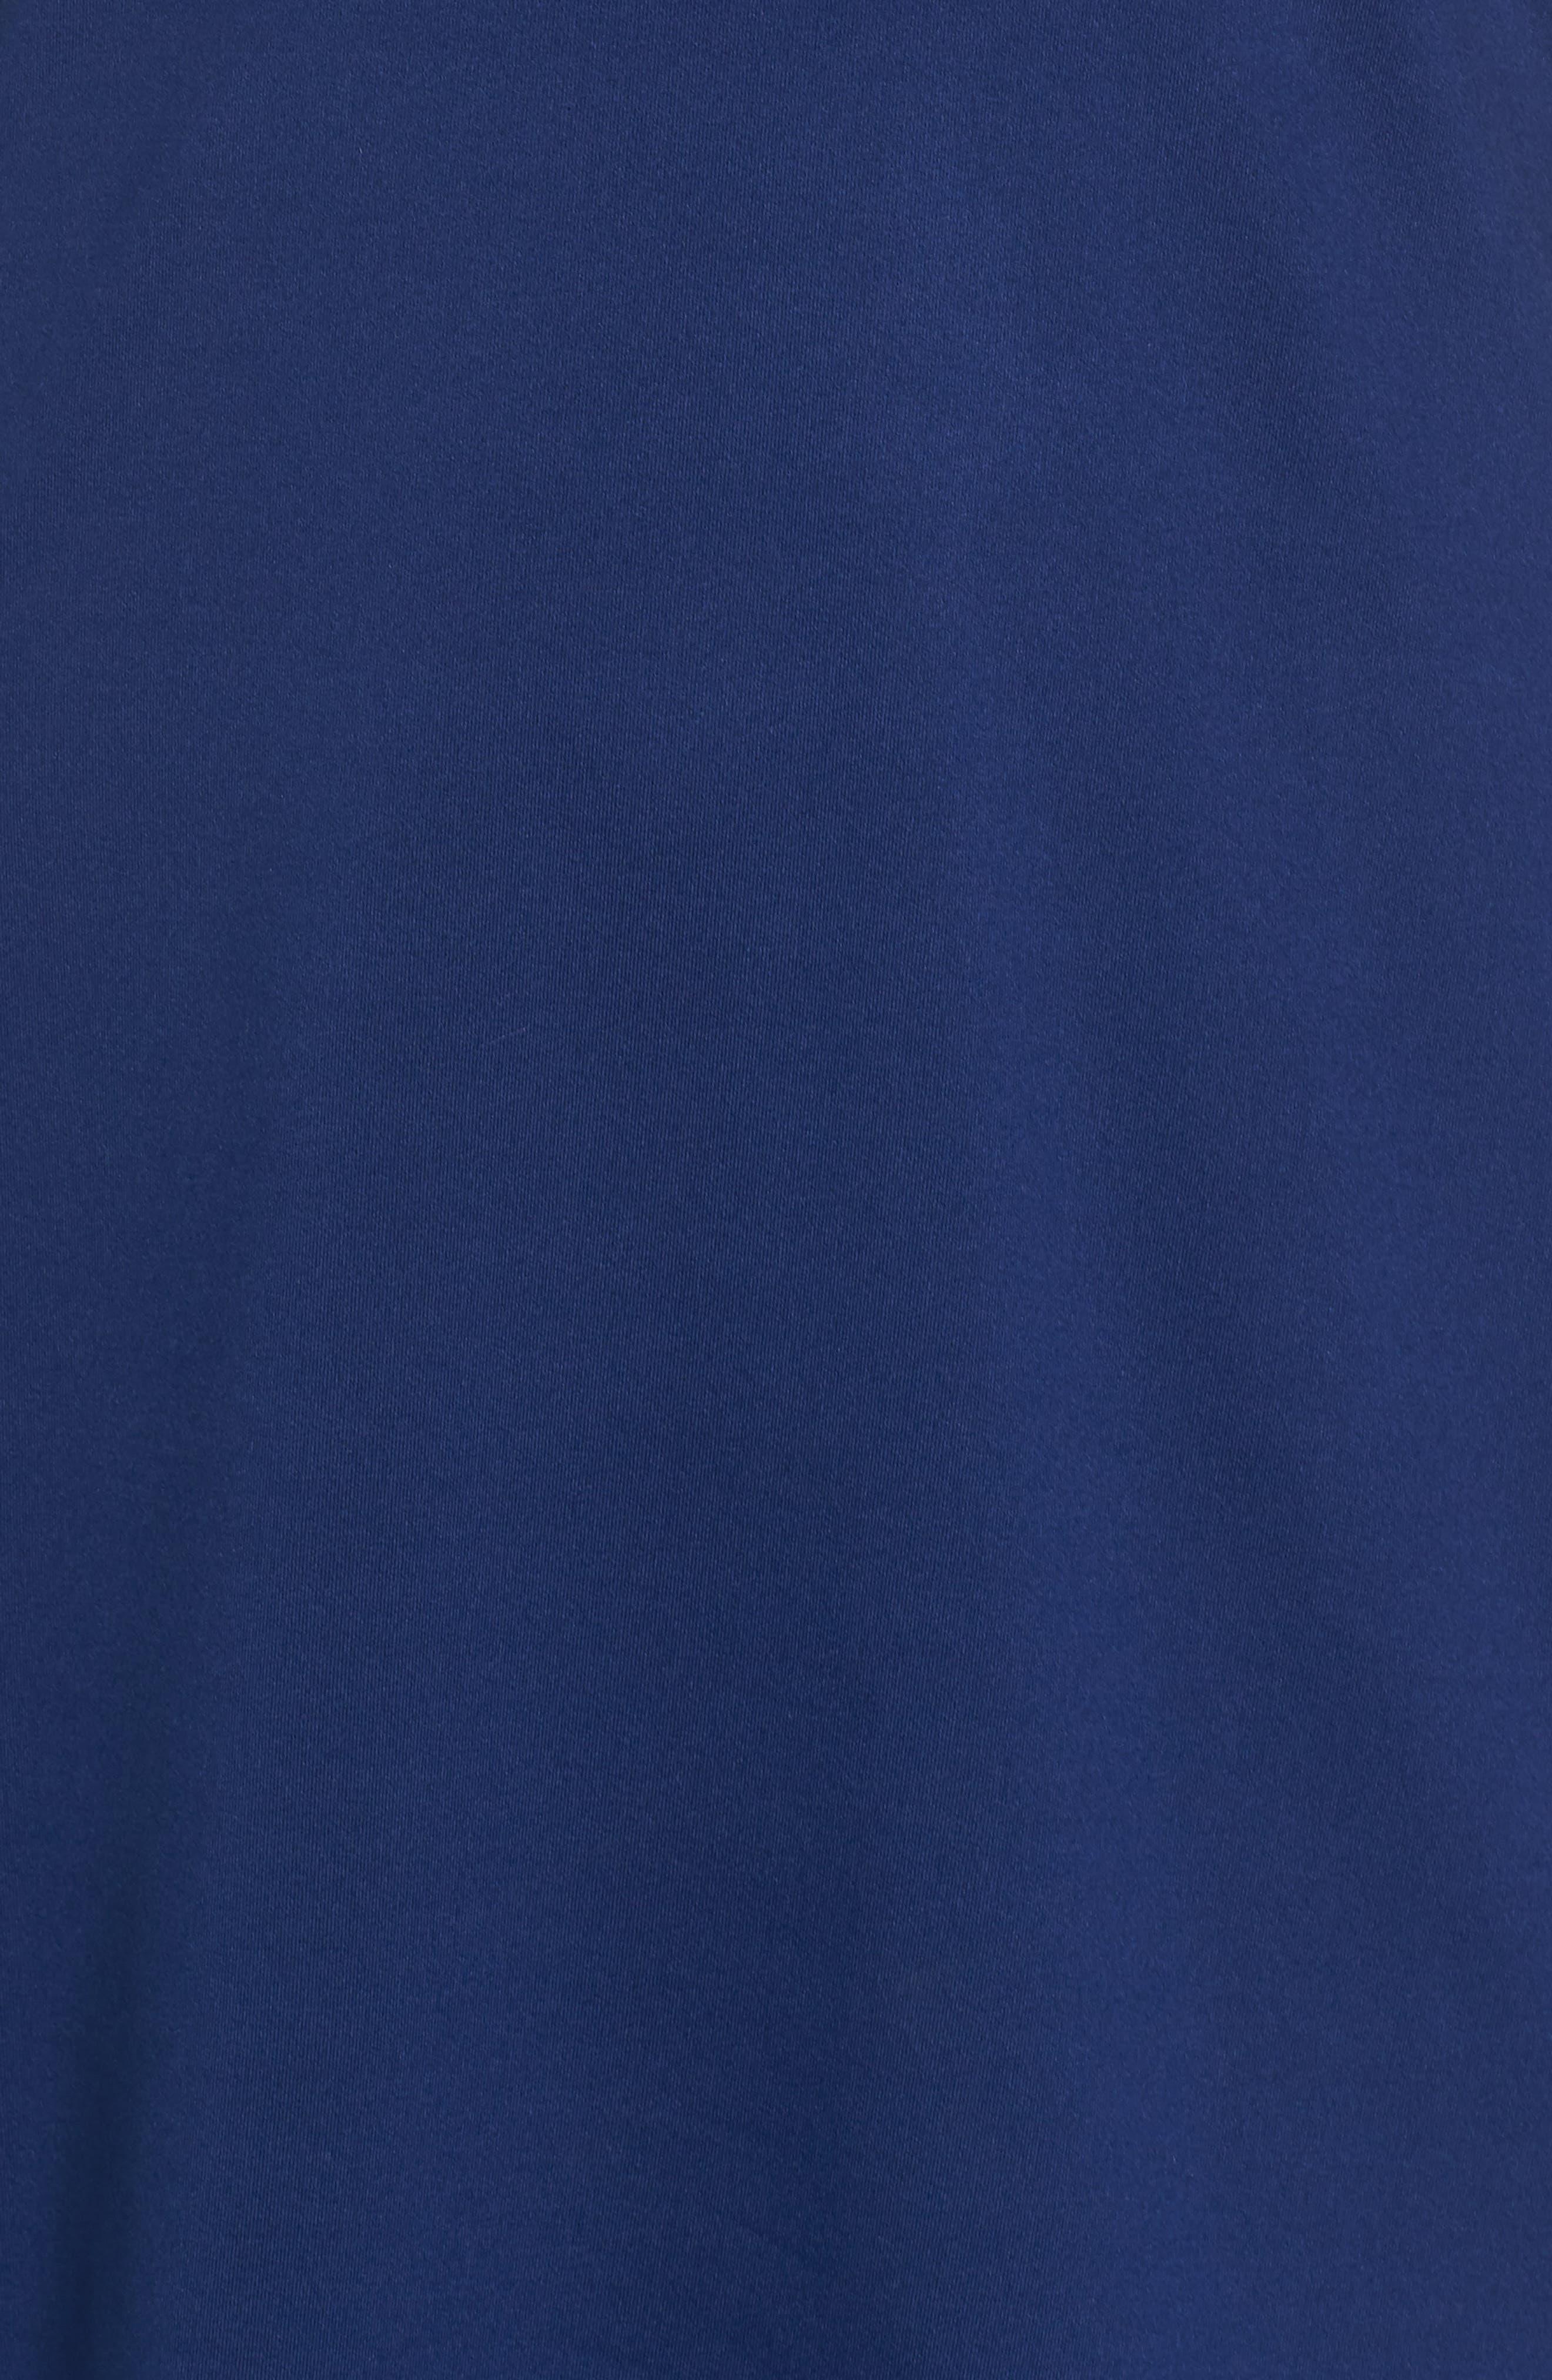 Dri-FIT Tennis Dress,                             Alternate thumbnail 6, color,                             492